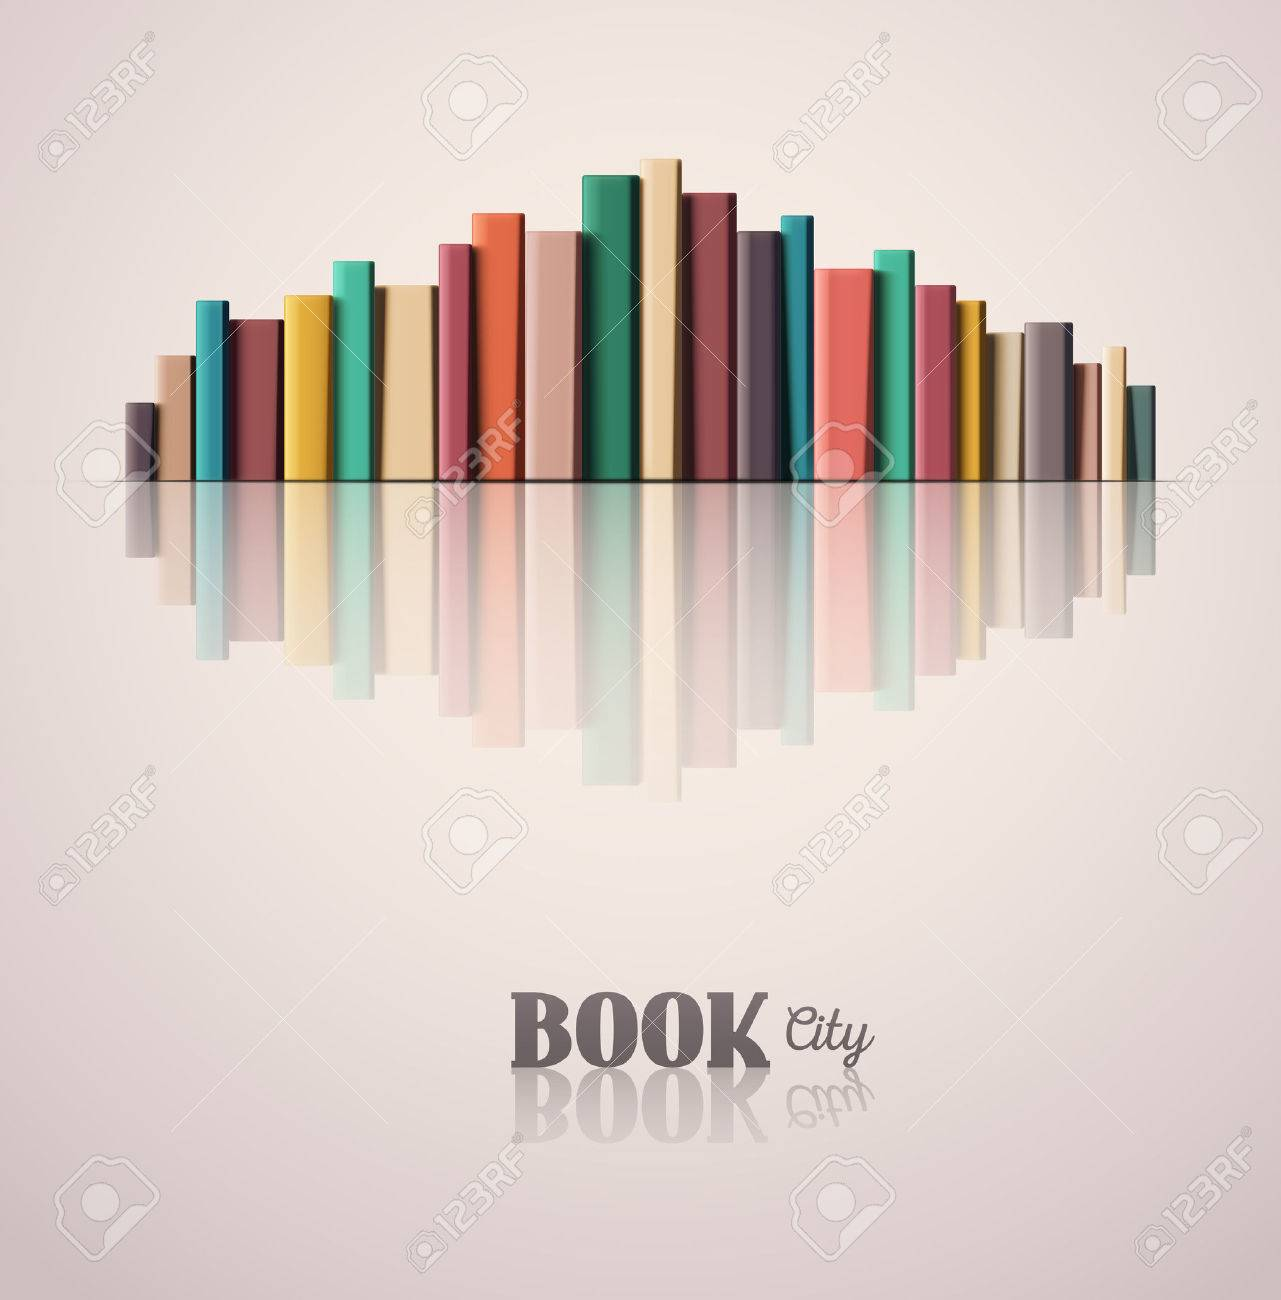 Stack of color books, book city, Standard-Bild - 39391520